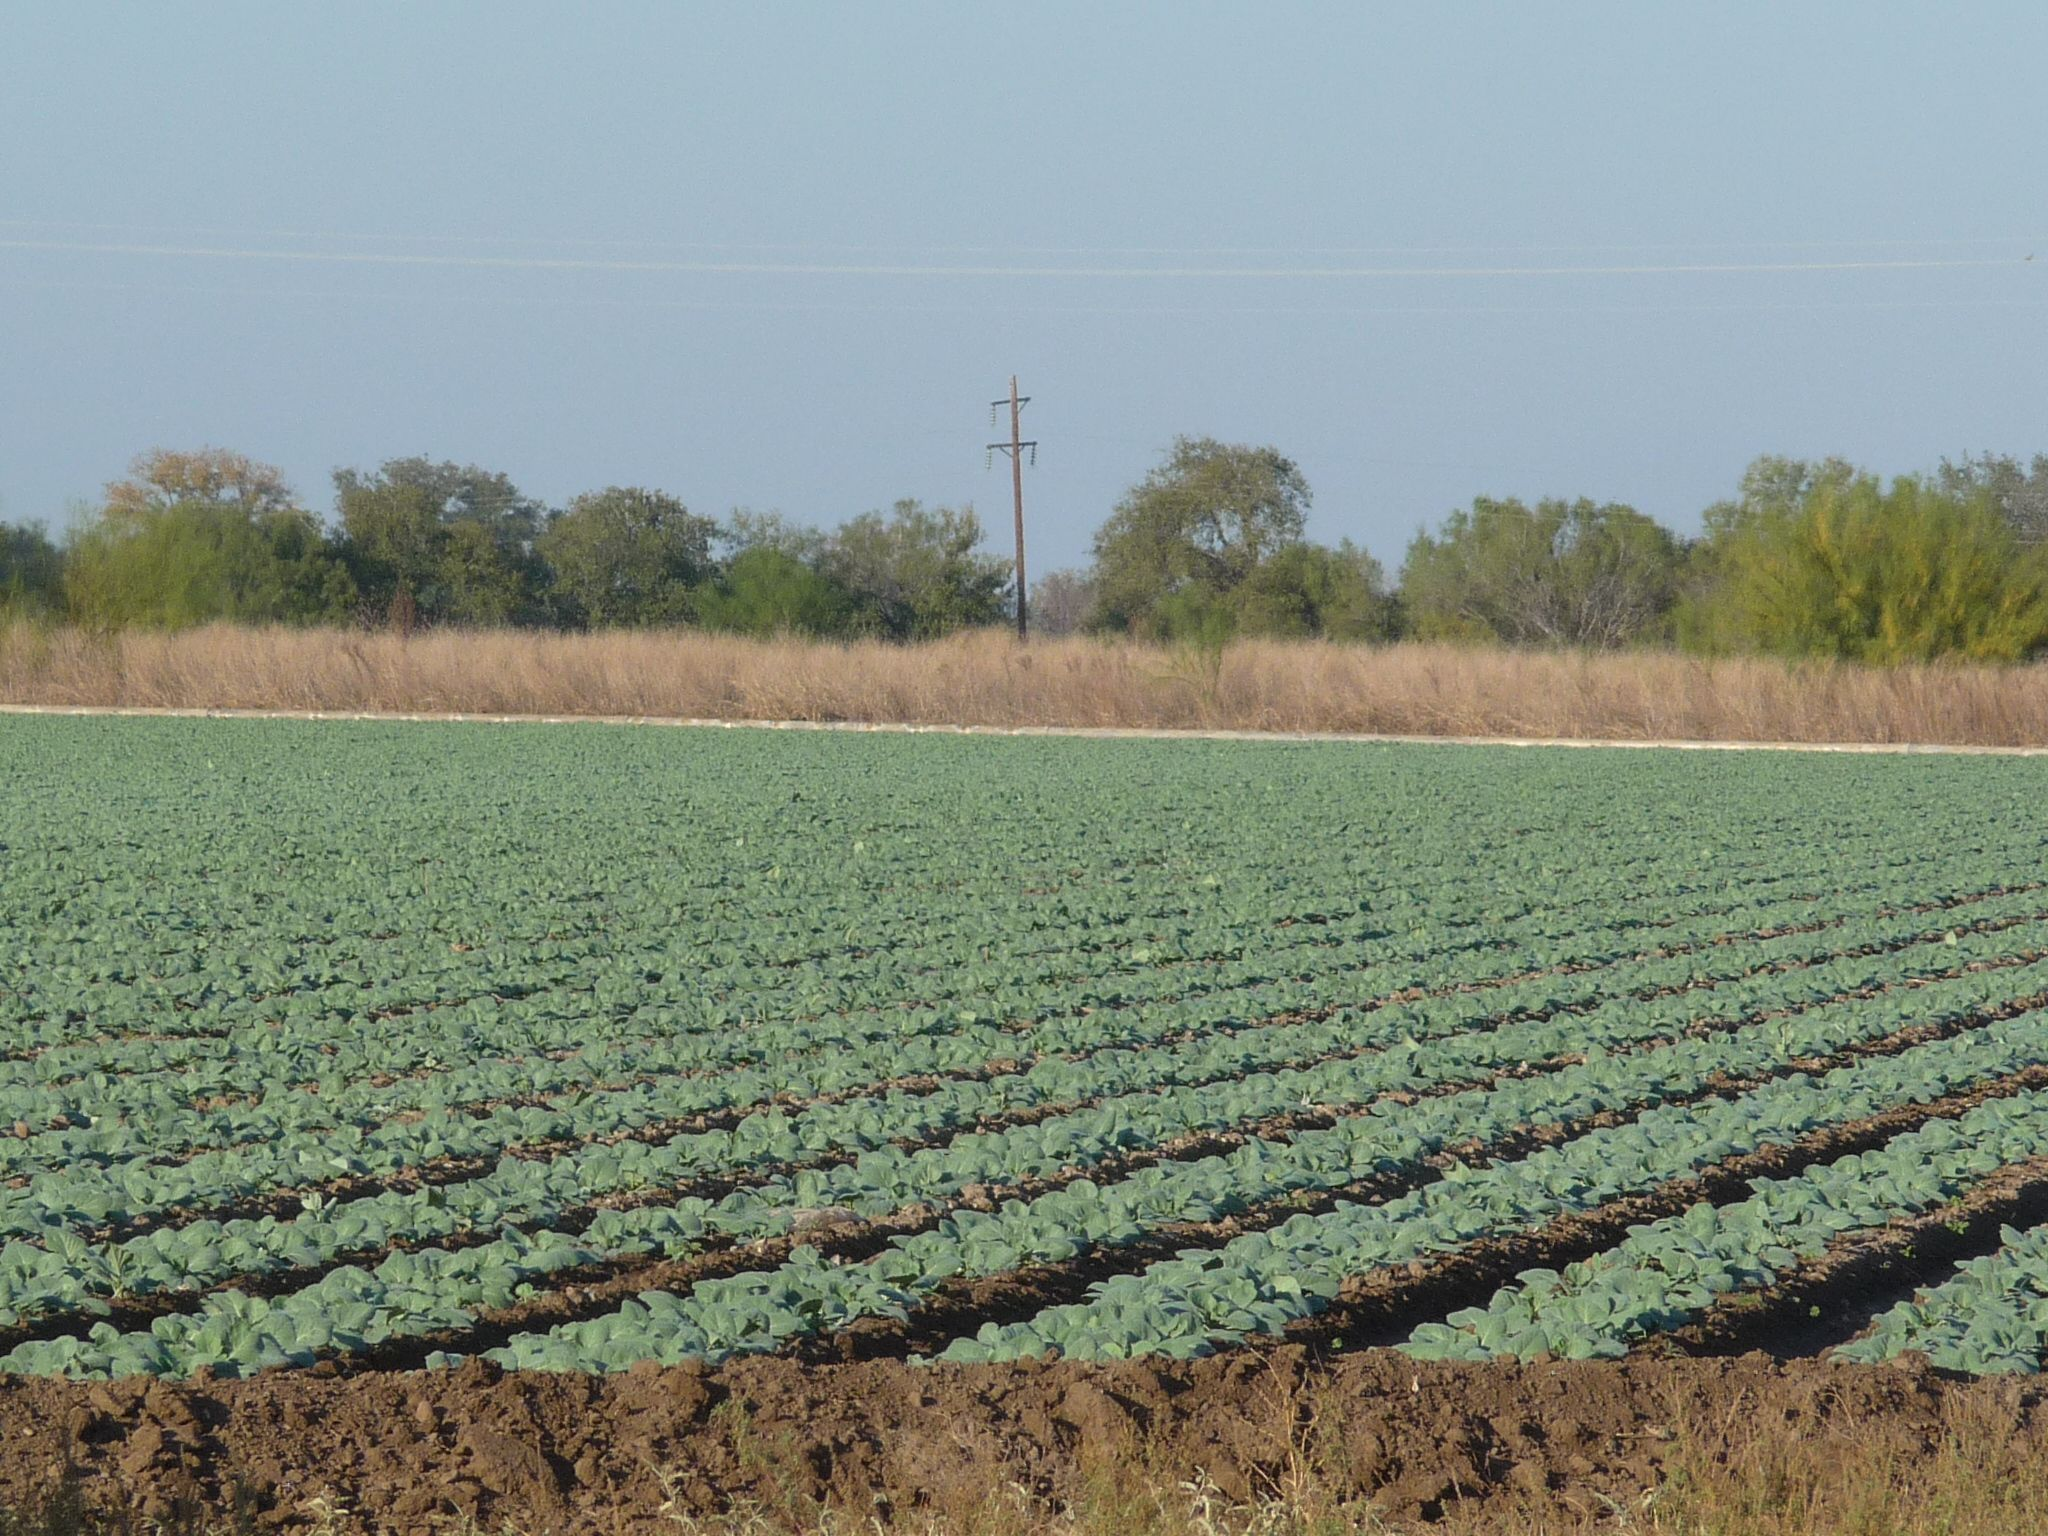 Crystal city texasfarm and ranch san antonio military